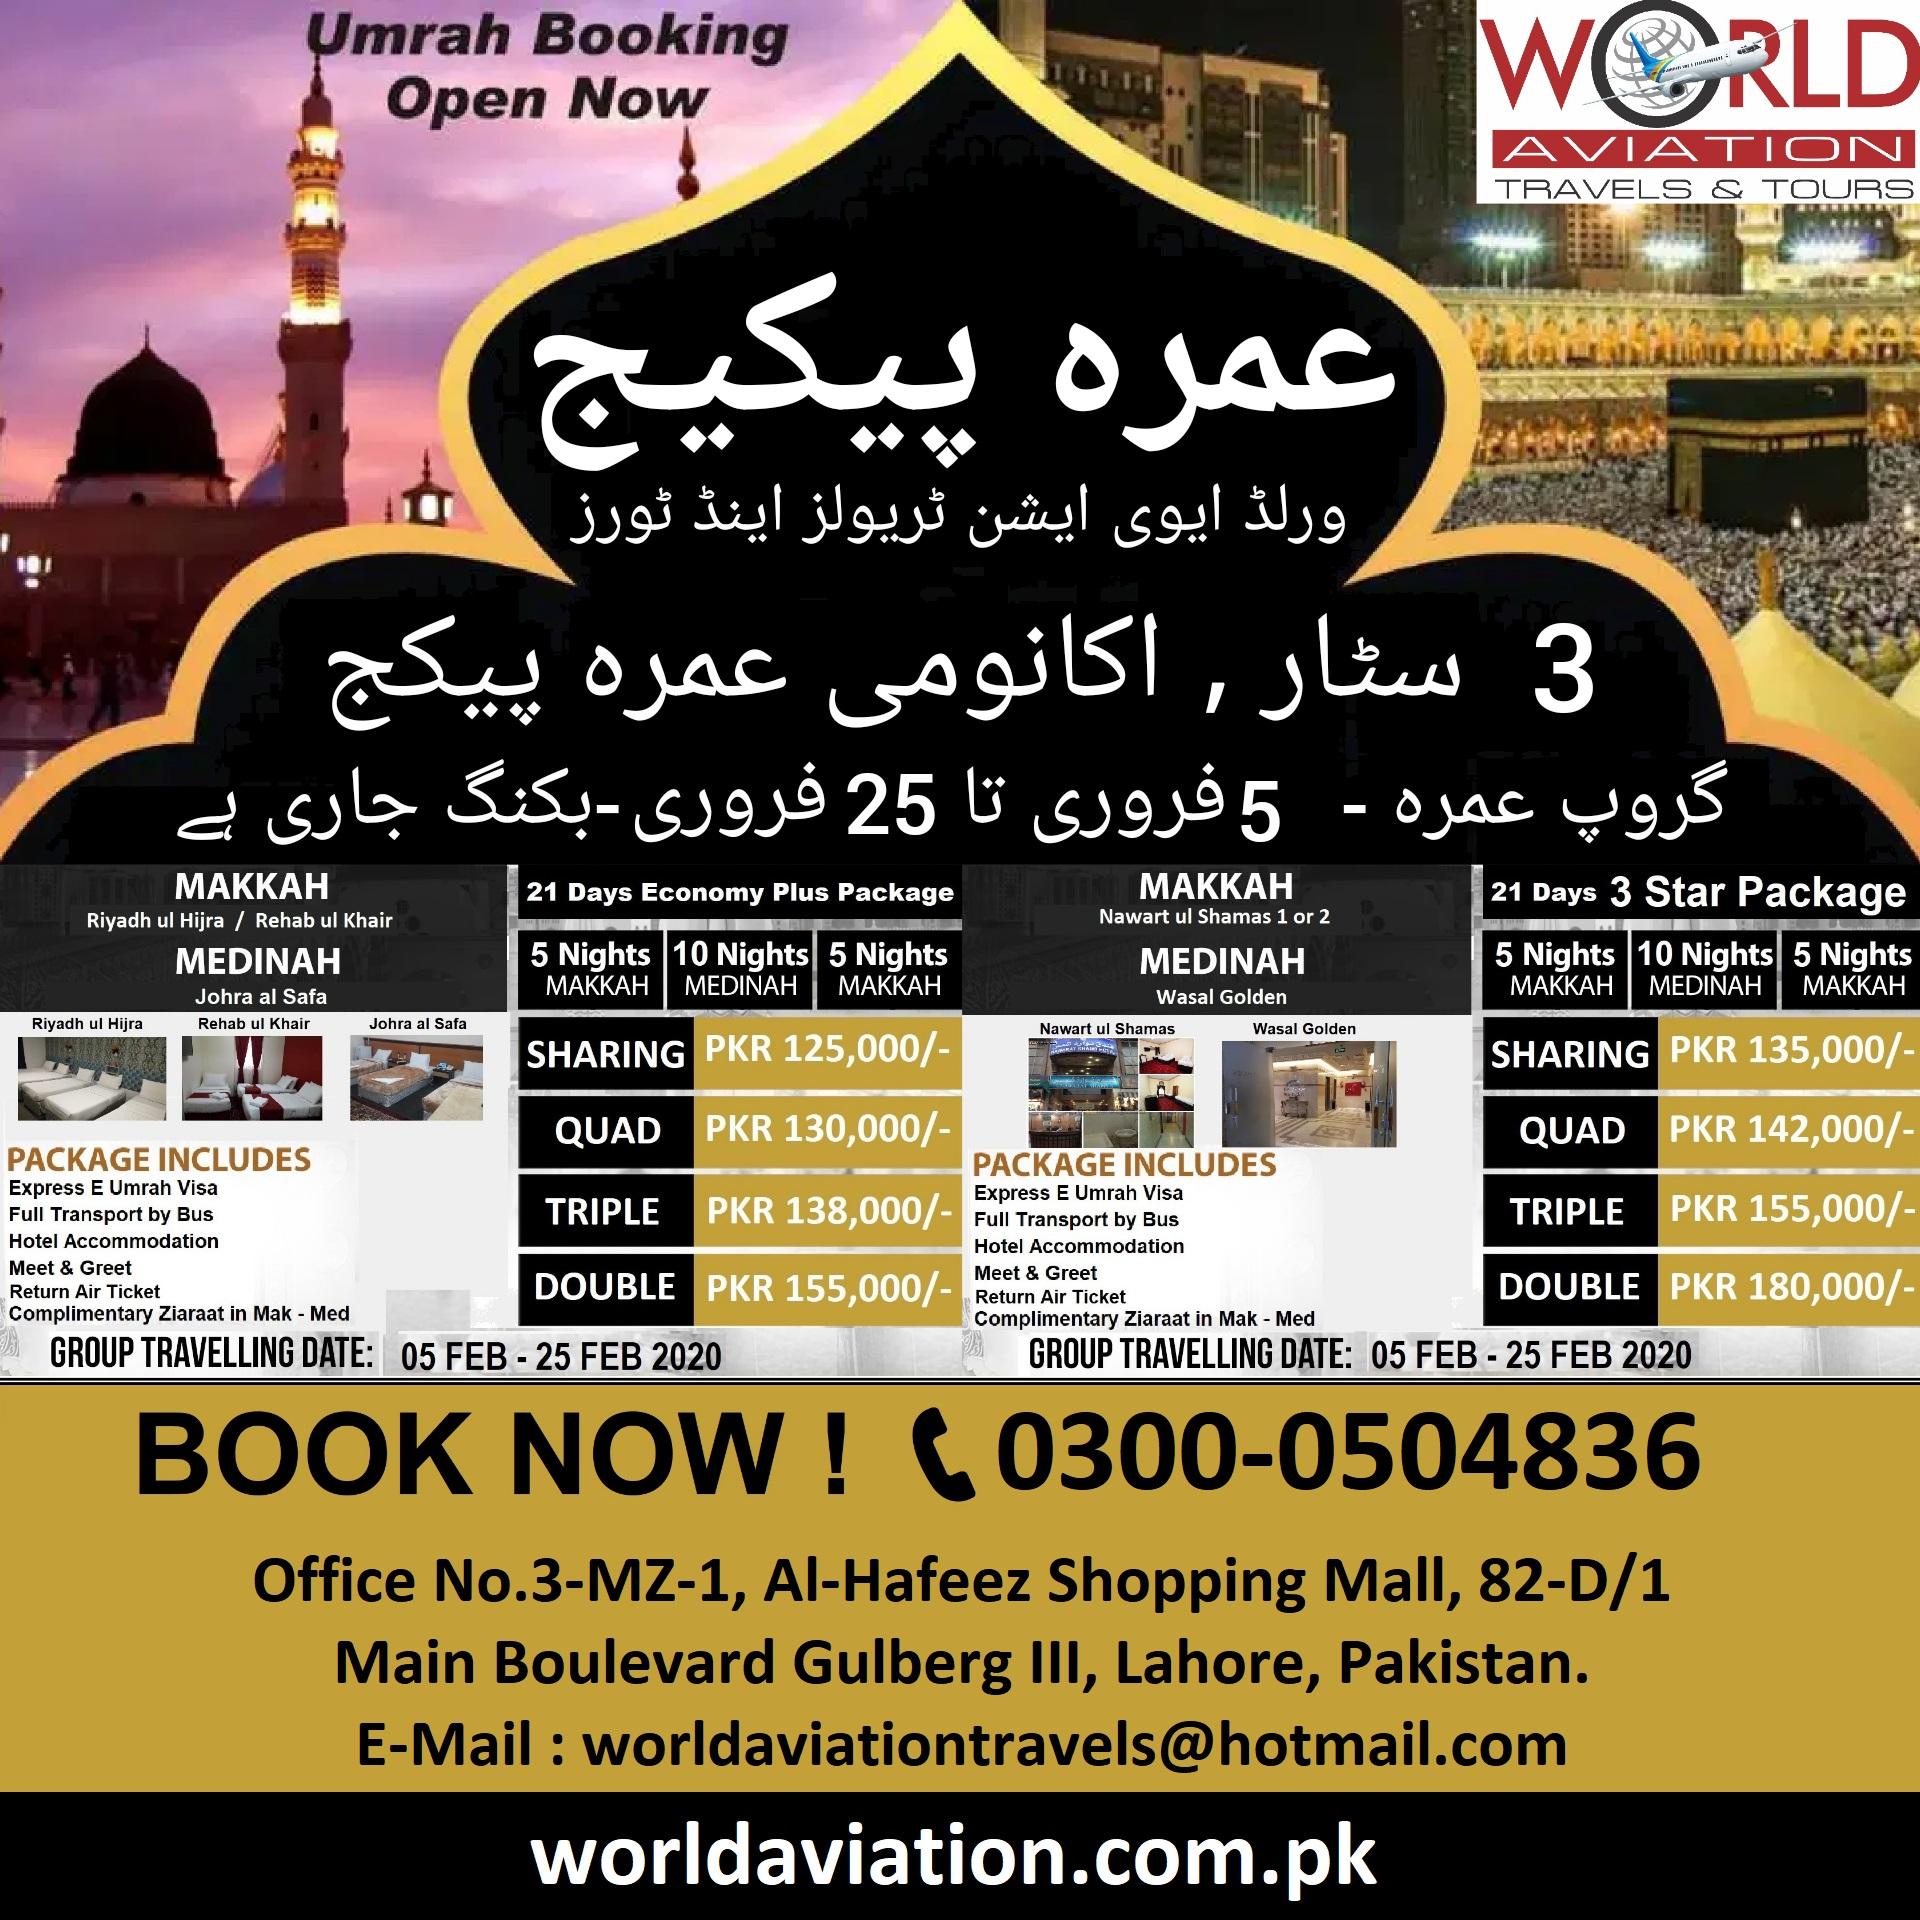 World Aviation Travels & Tours